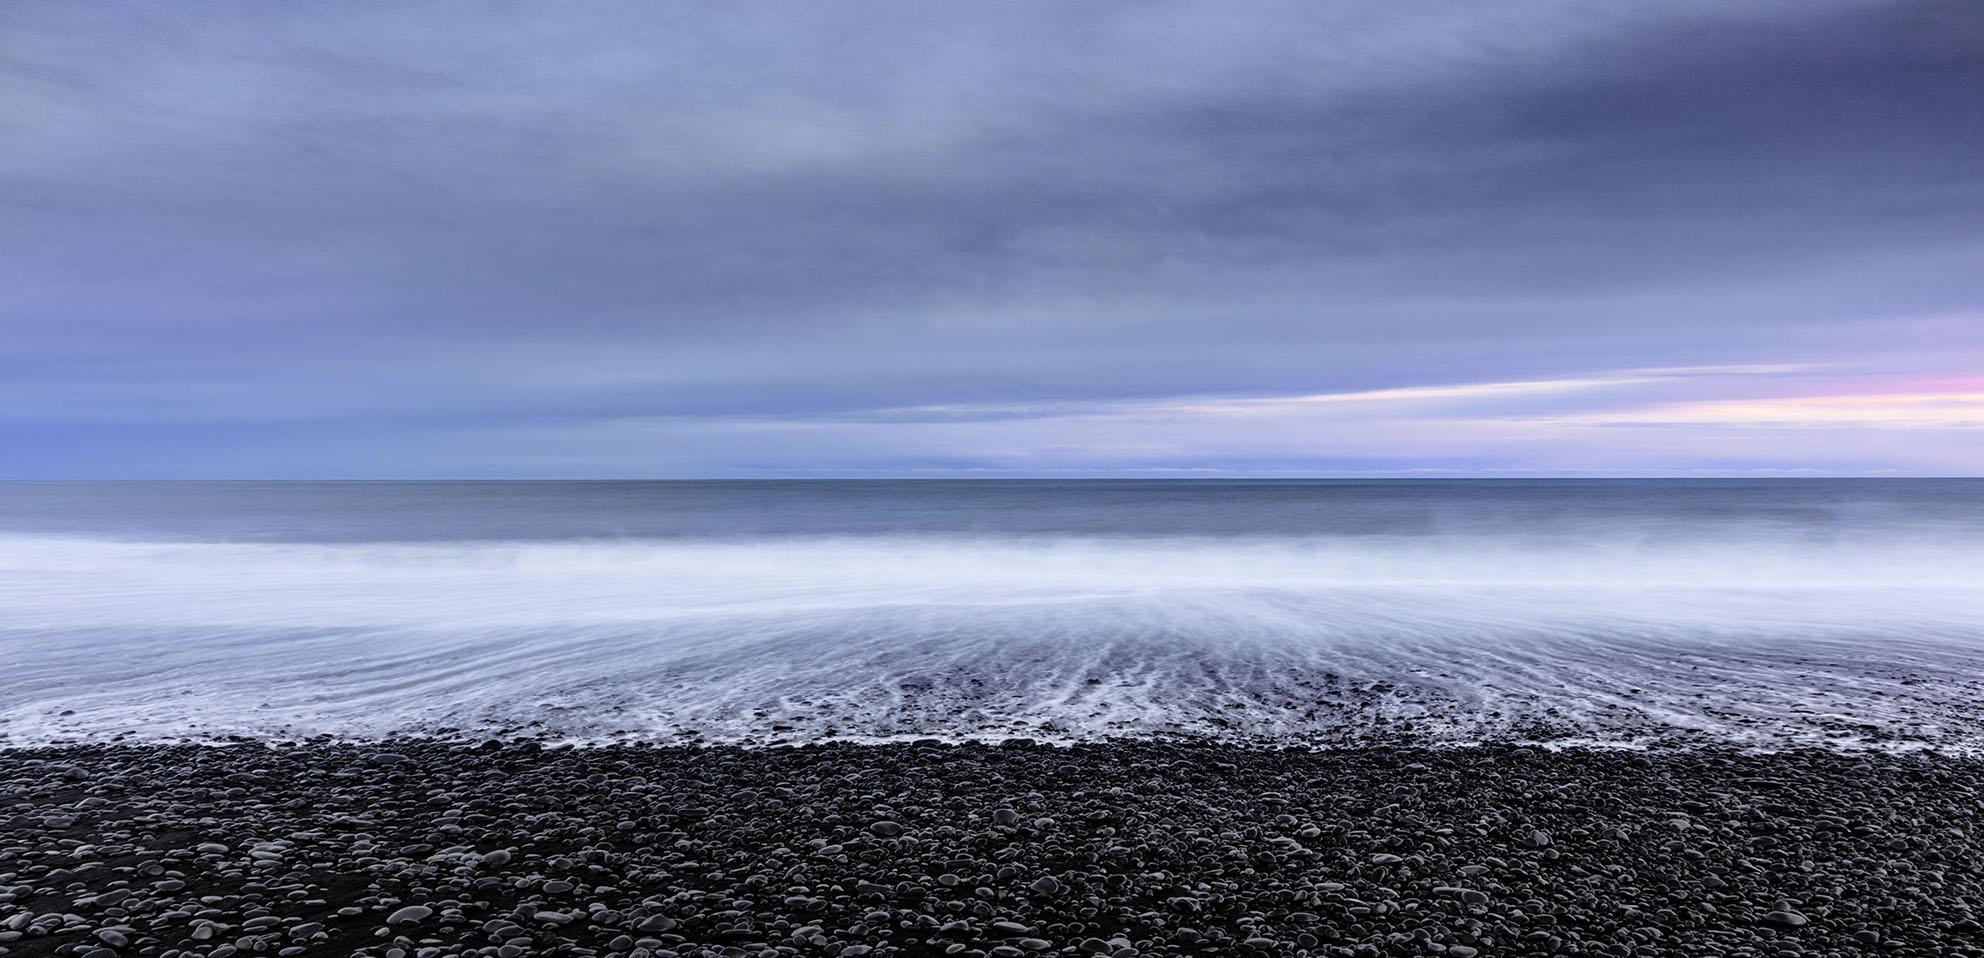 Black_Sand_Beach_layers_01.jpg